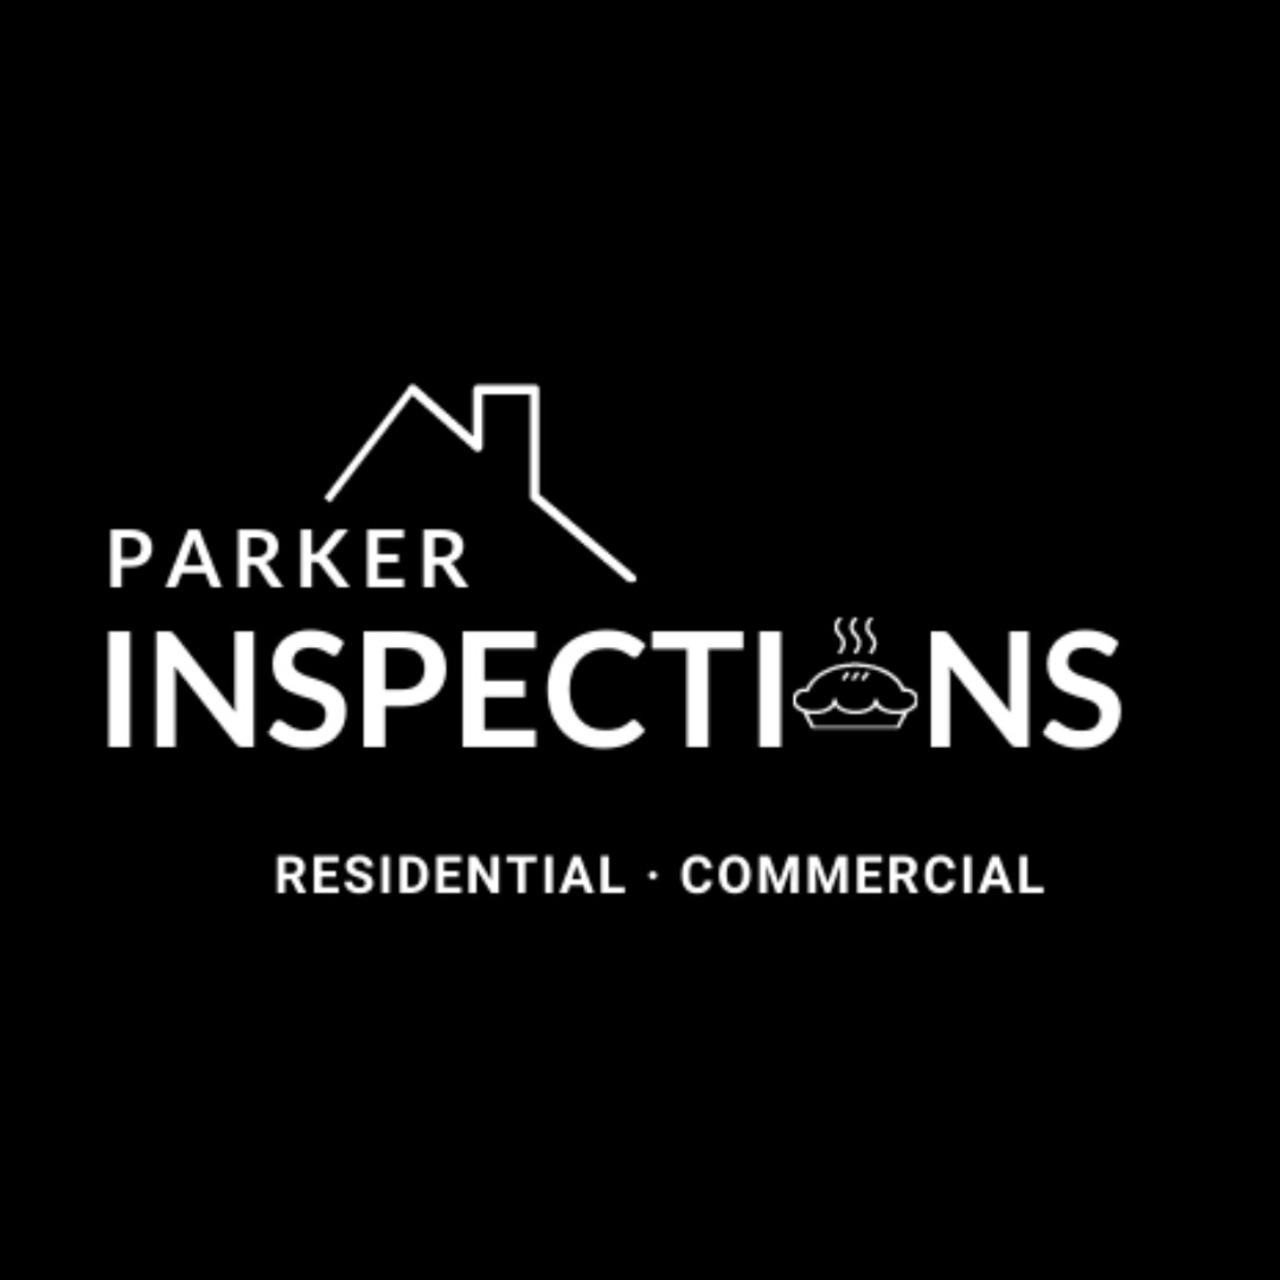 Parker Inspections